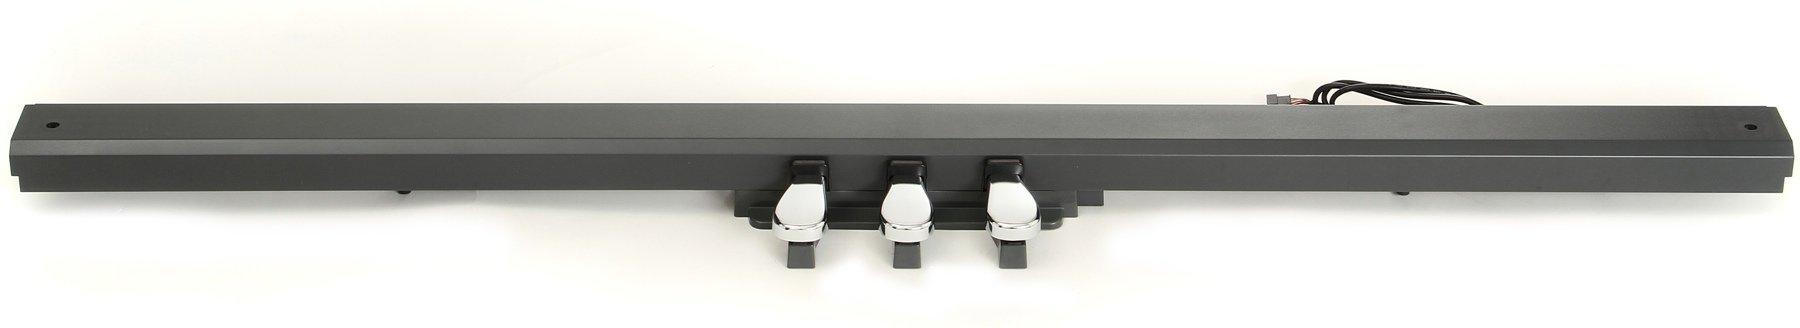 Casio SP33 Three Pedal Board